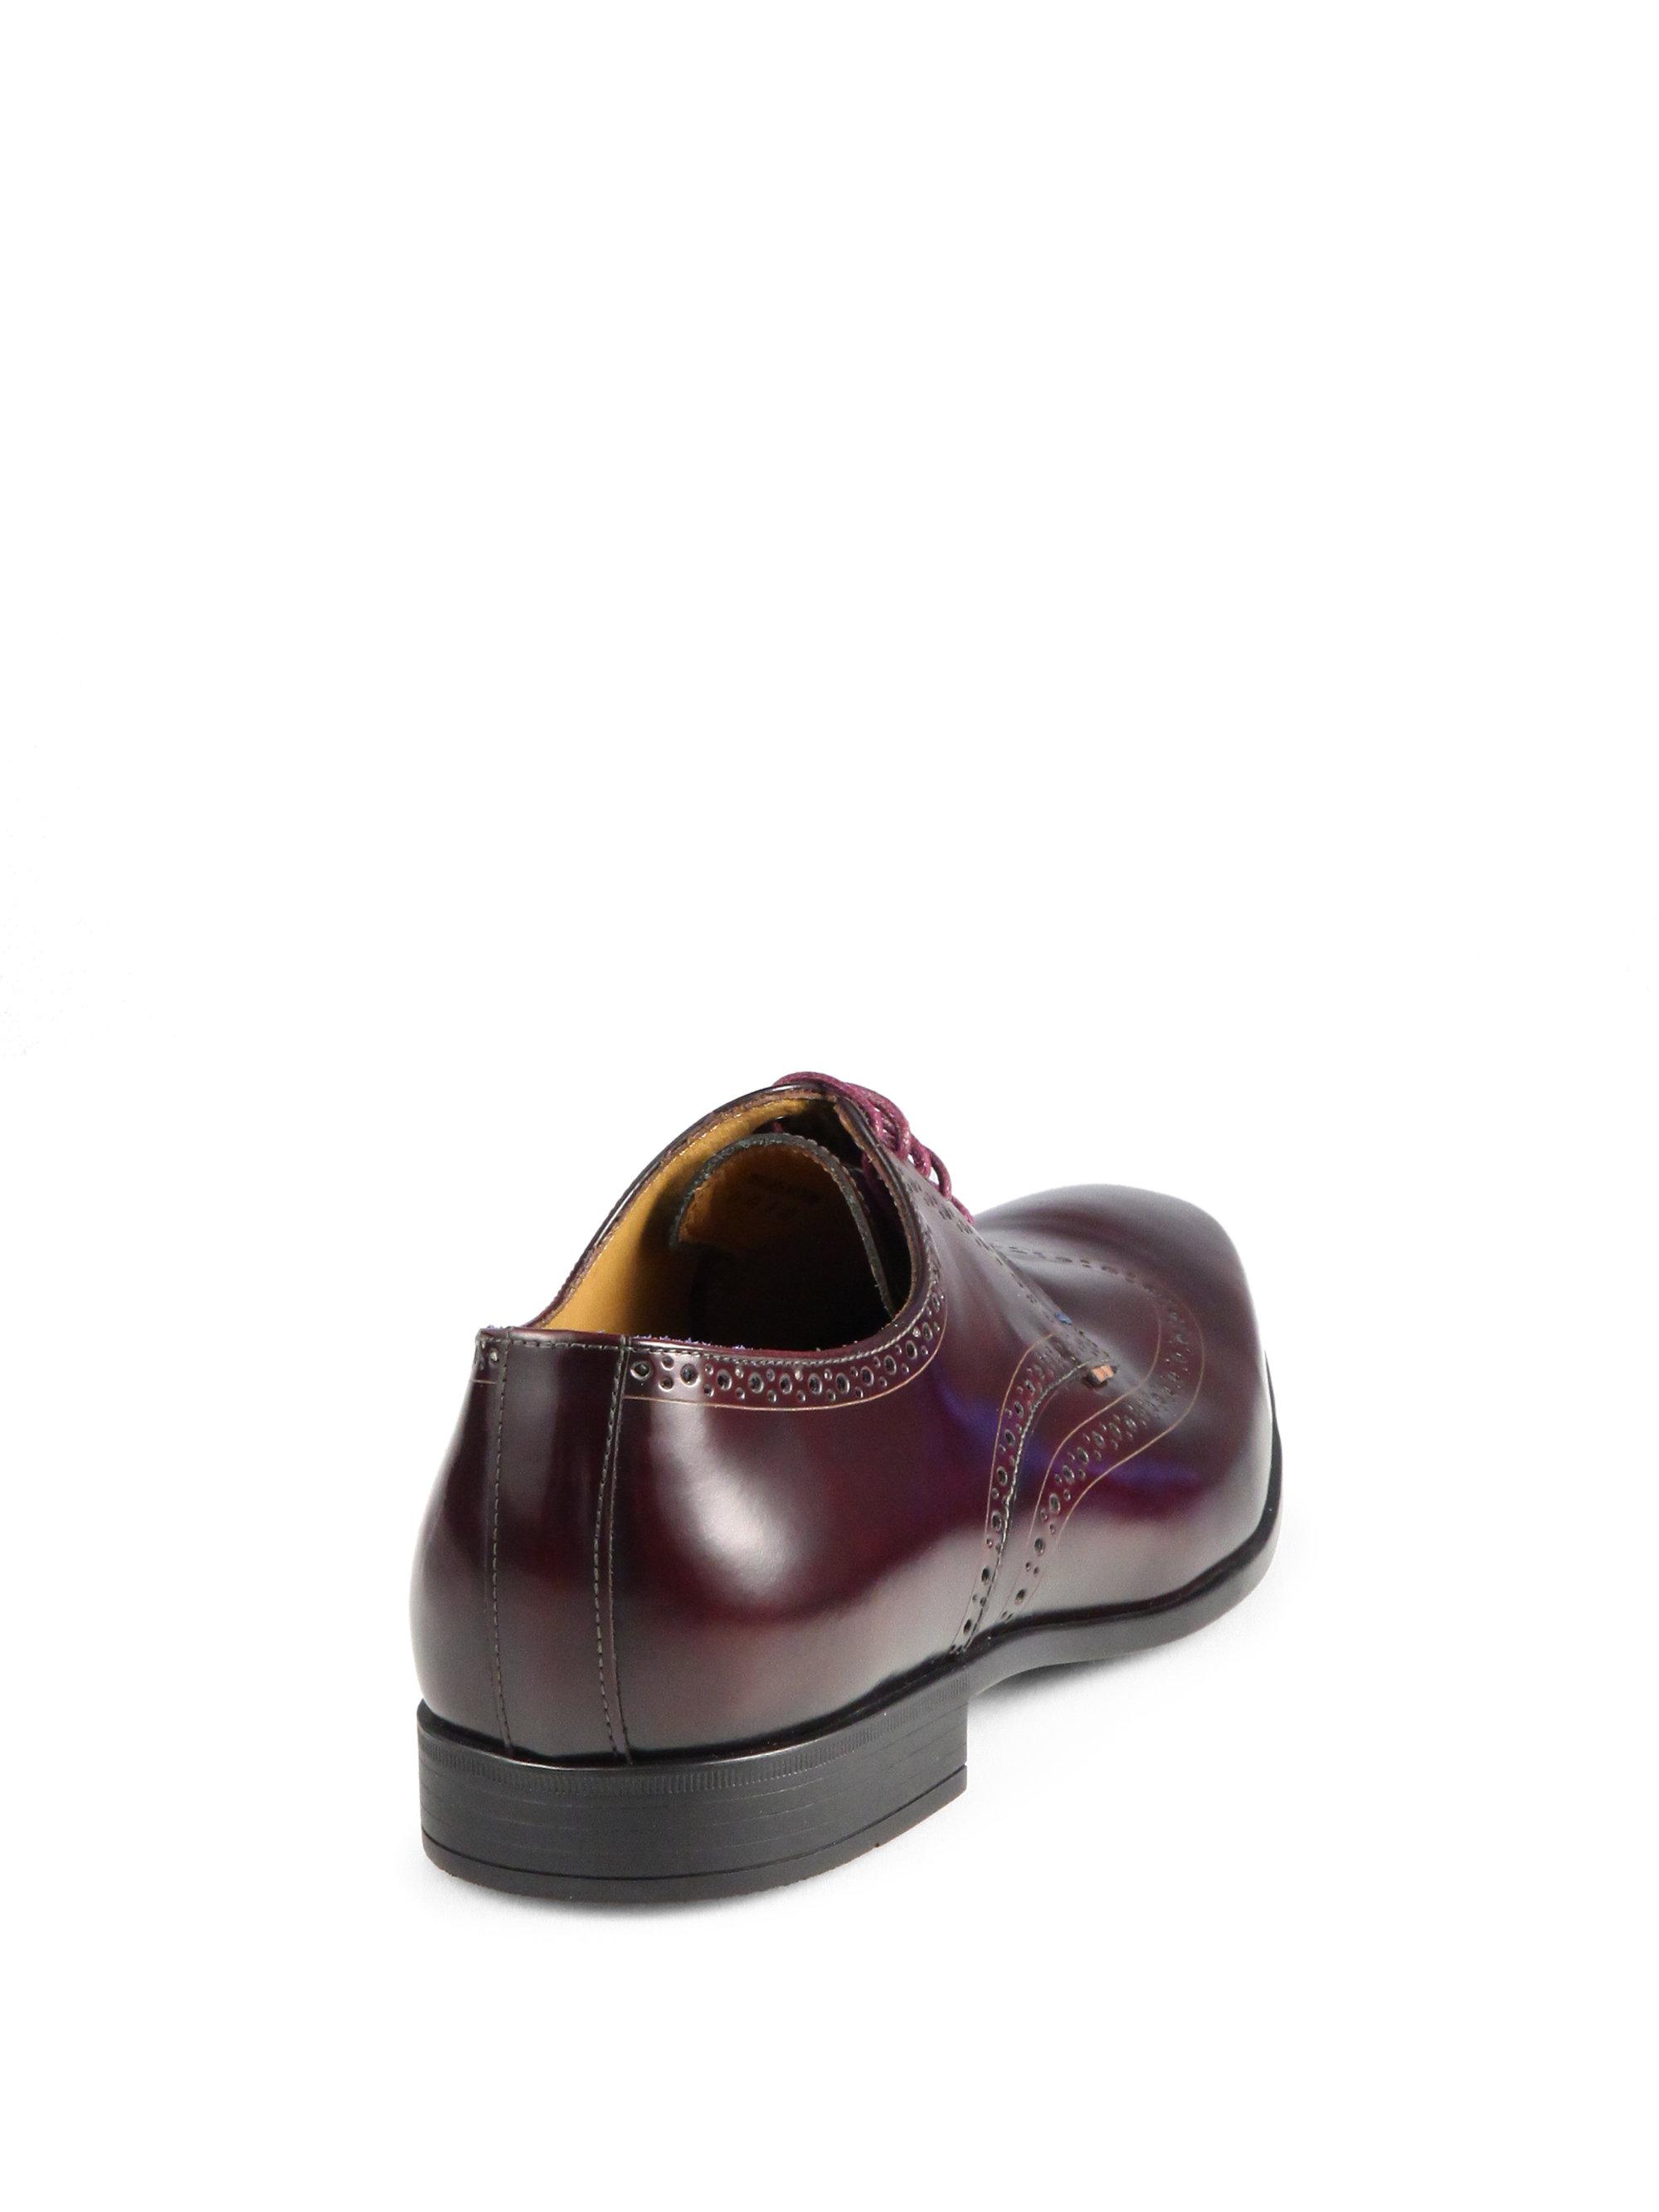 Macey Shoes Men